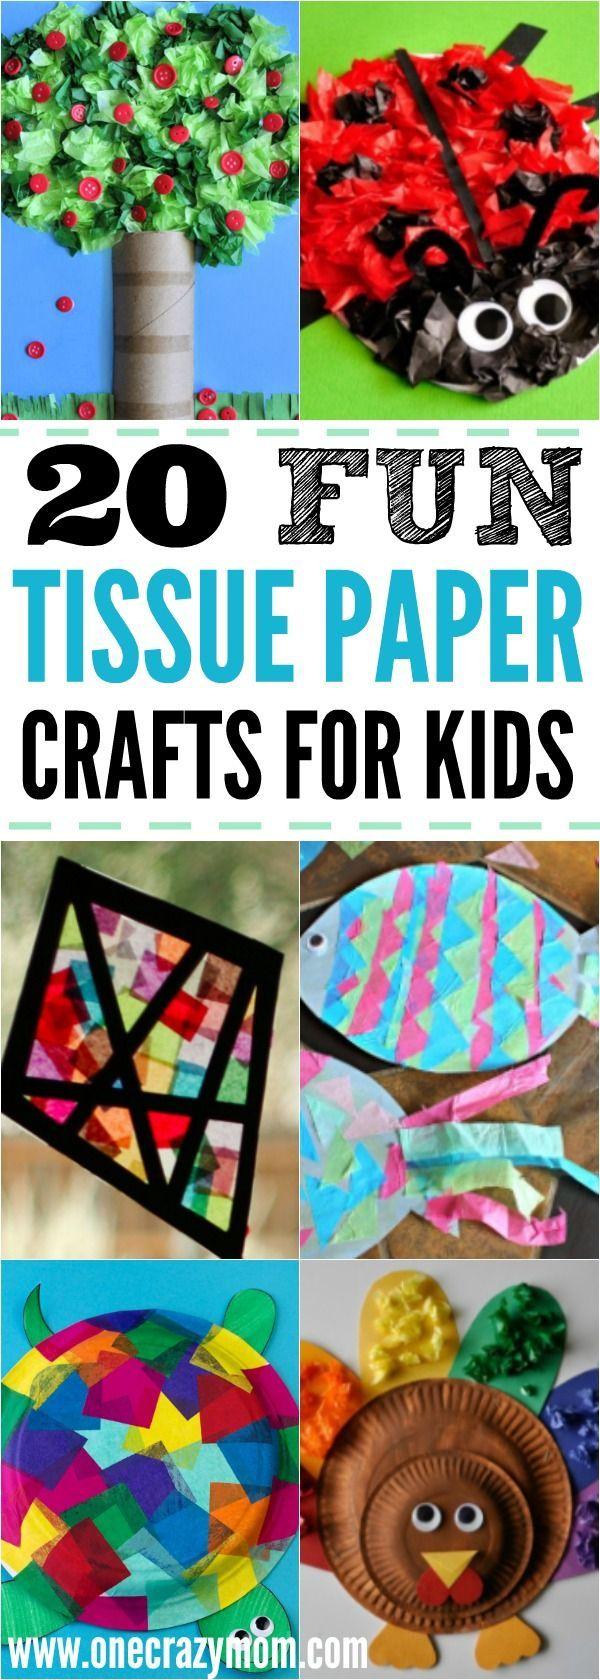 Tissue Paper Crafts for Kids – 20 fun tissue crafts that kids can make